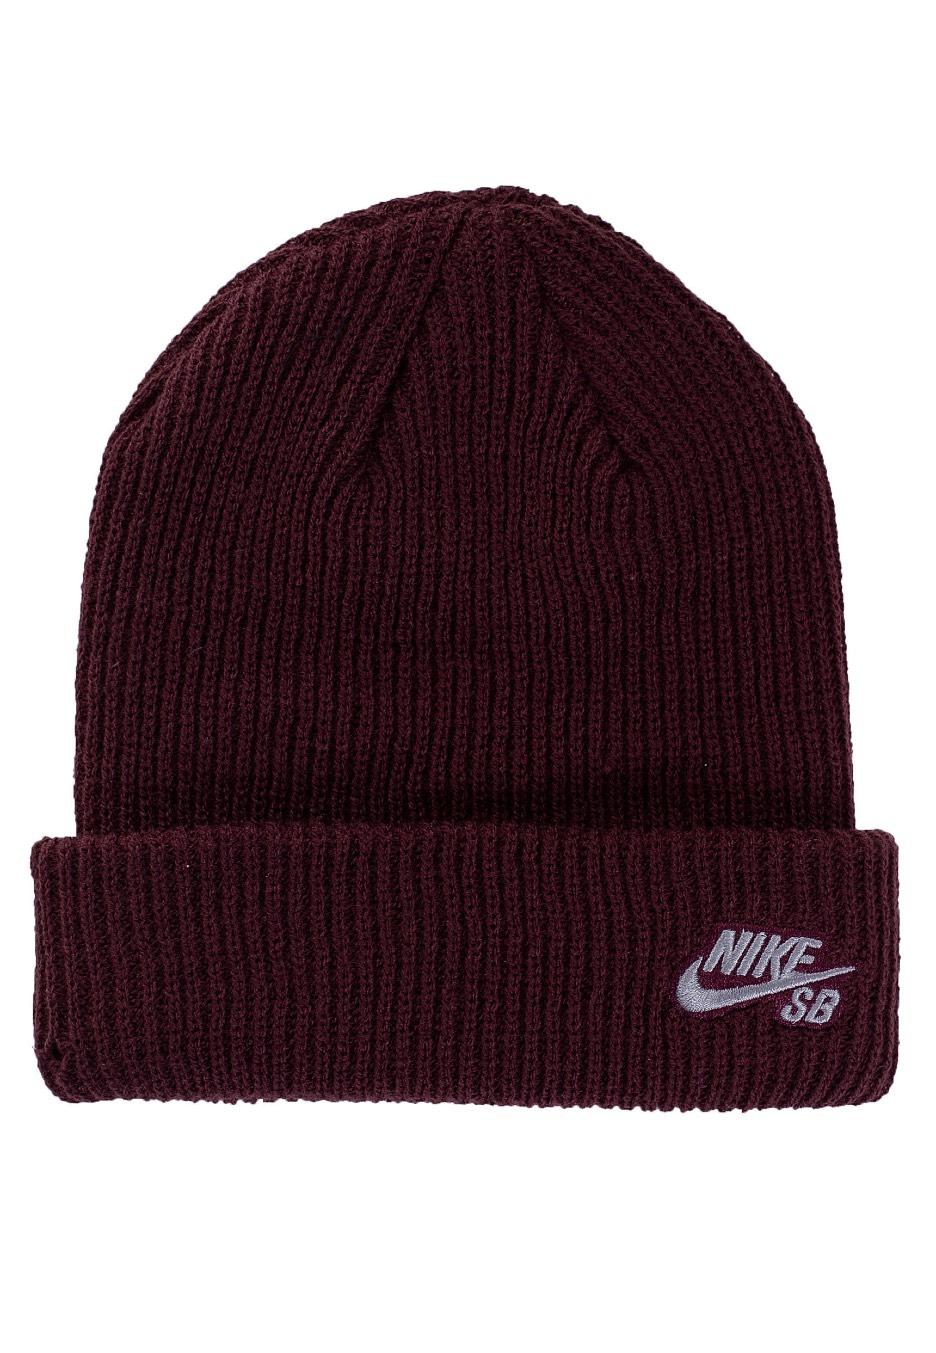 12e05f27 Nike SB - Fisherman Burgundy Crush/Gunsmoke - Beanie - Streetwear Shop -  Impericon.com Worldwide